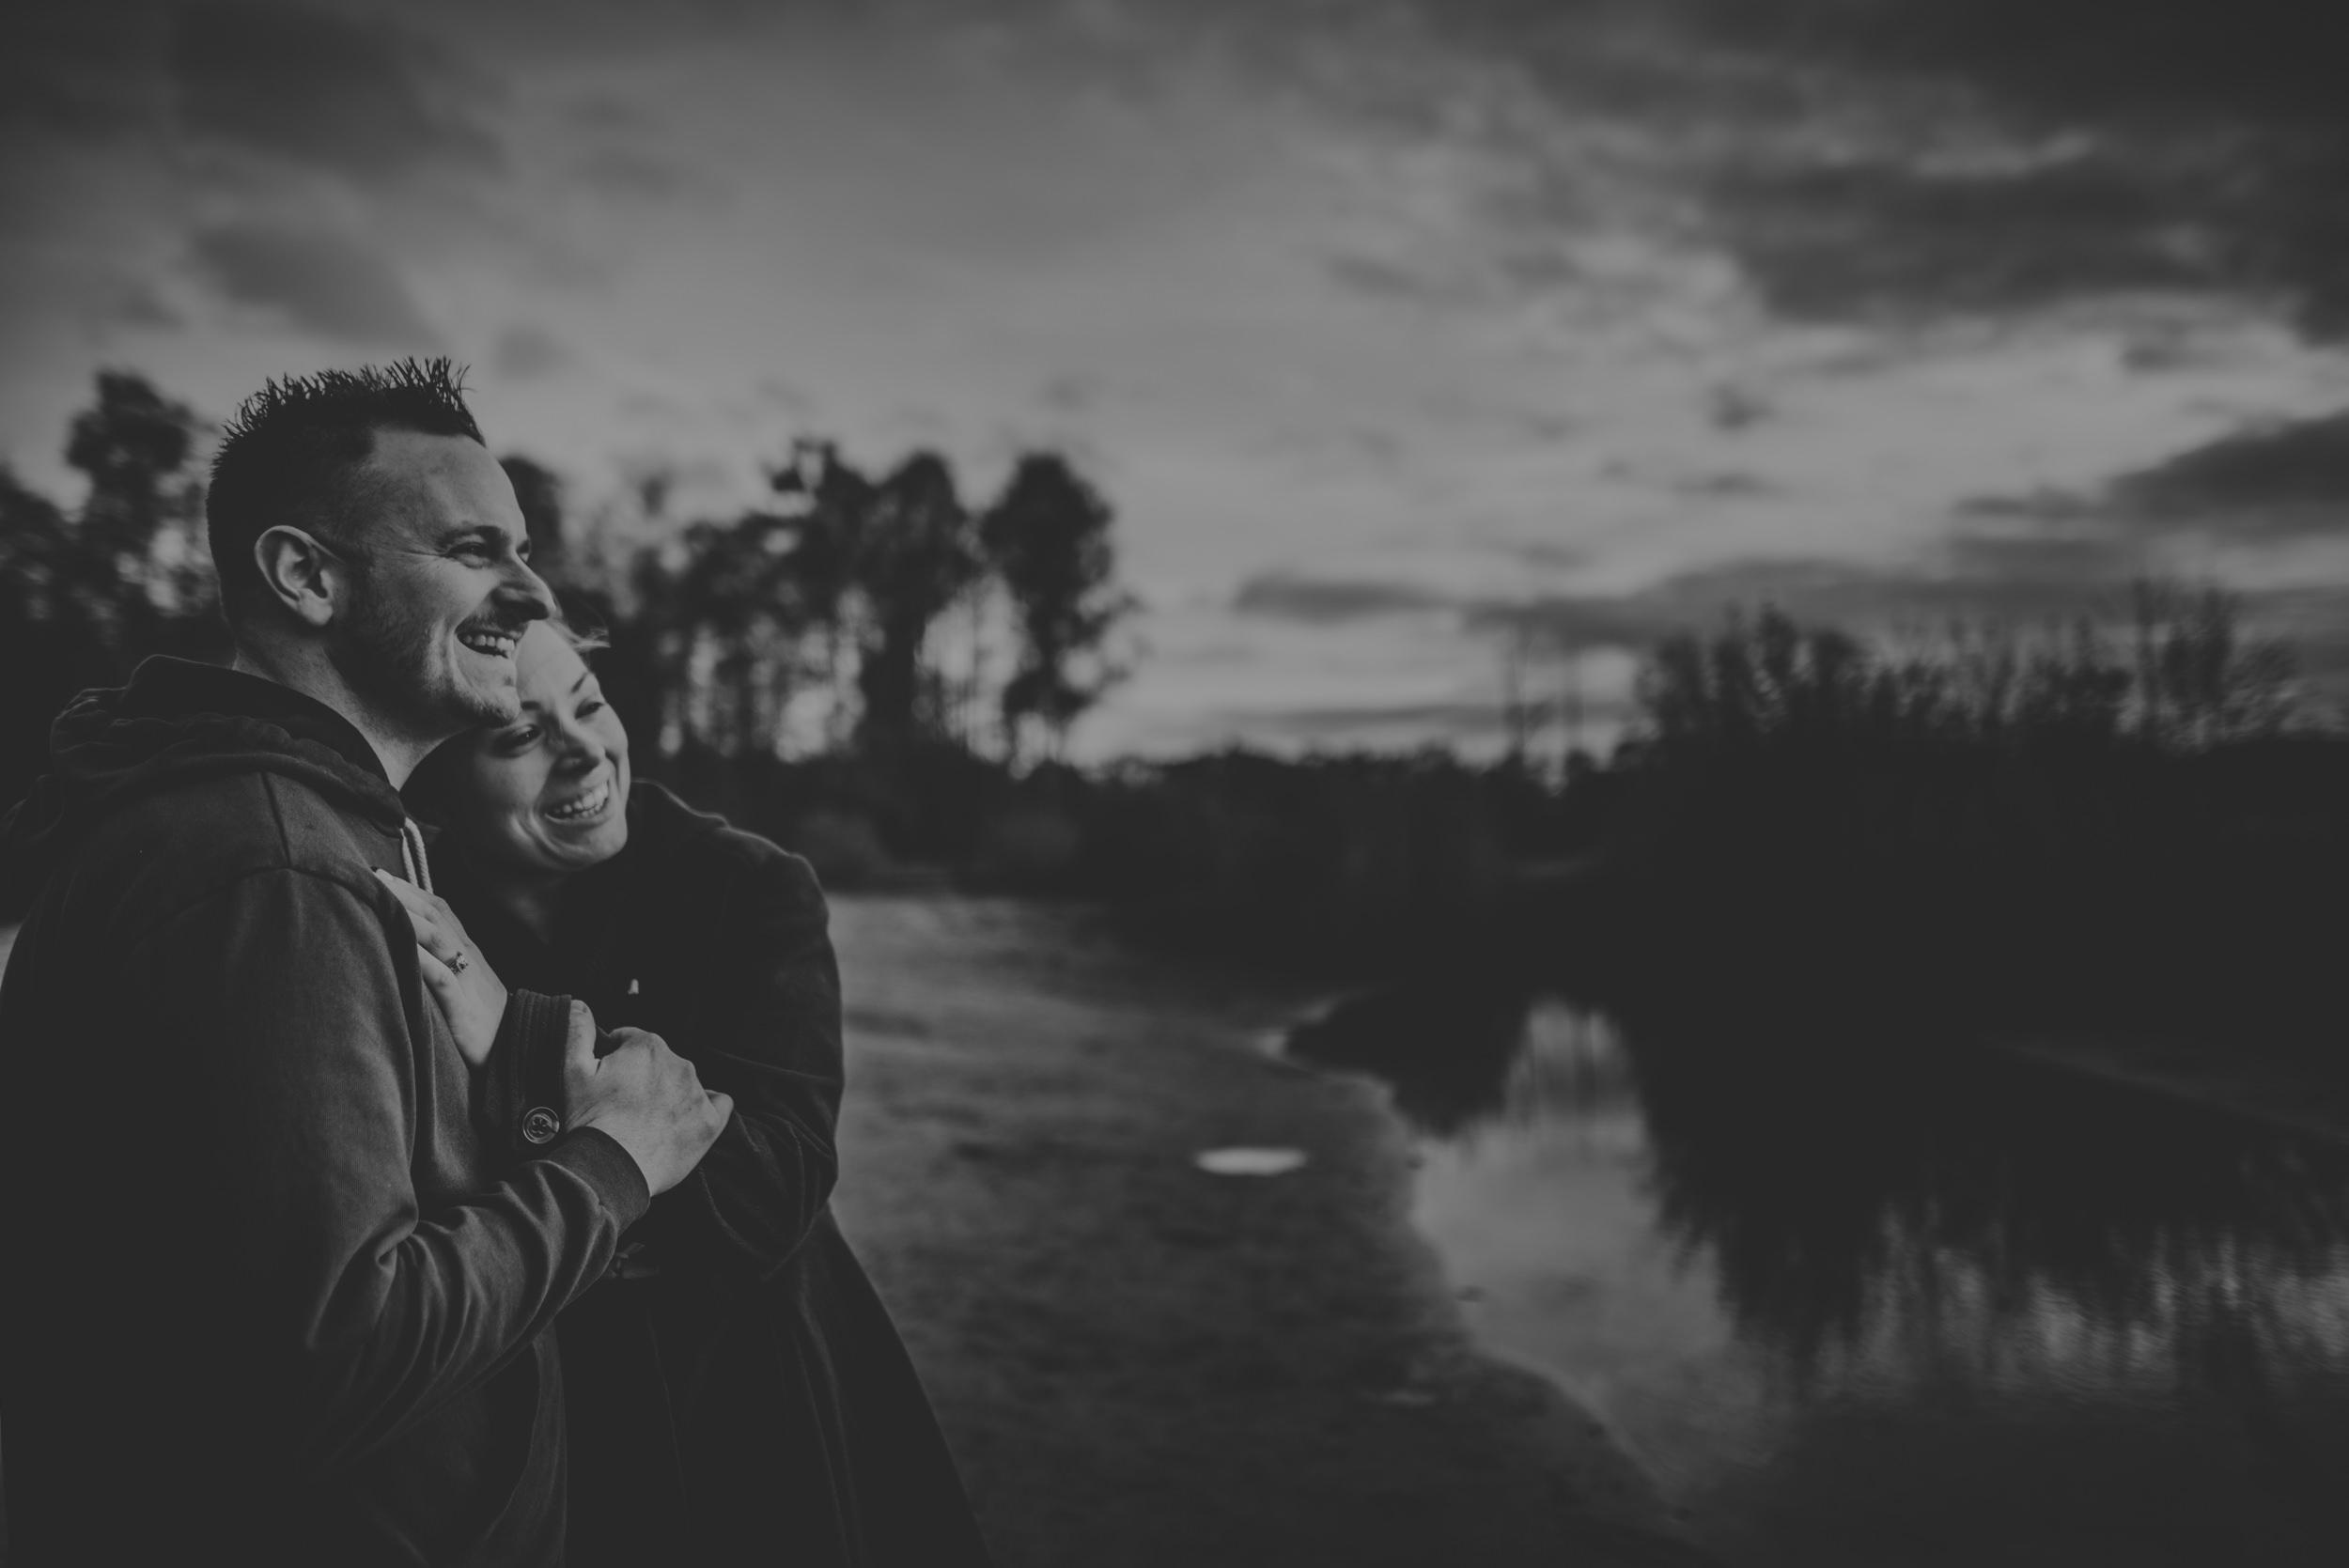 Hannah-and-Sam-Engagement-Sesion-in-Fleet-Pond-Hampshire-Manu-Mendoza-Wedding-Photography-083.jpg